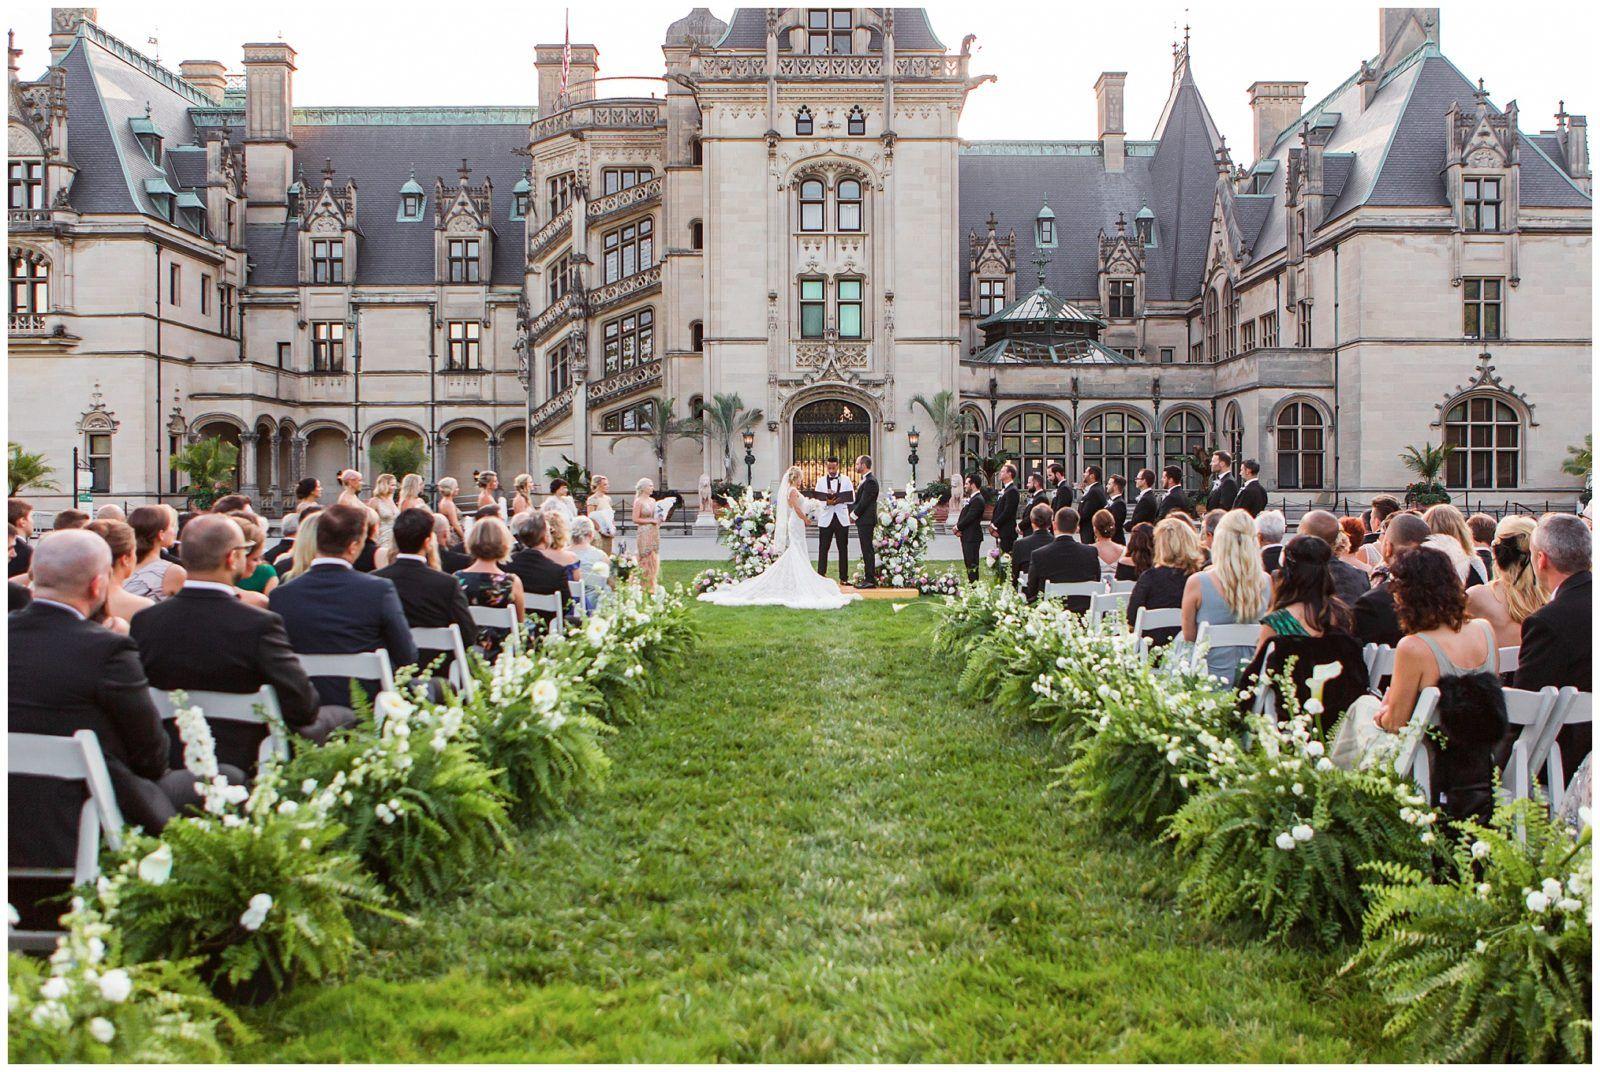 Lara Justin S Asheville Destination Wedding At Biltmore Estate In 2020 Biltmore Wedding Biltmore Estate Asheville Wedding